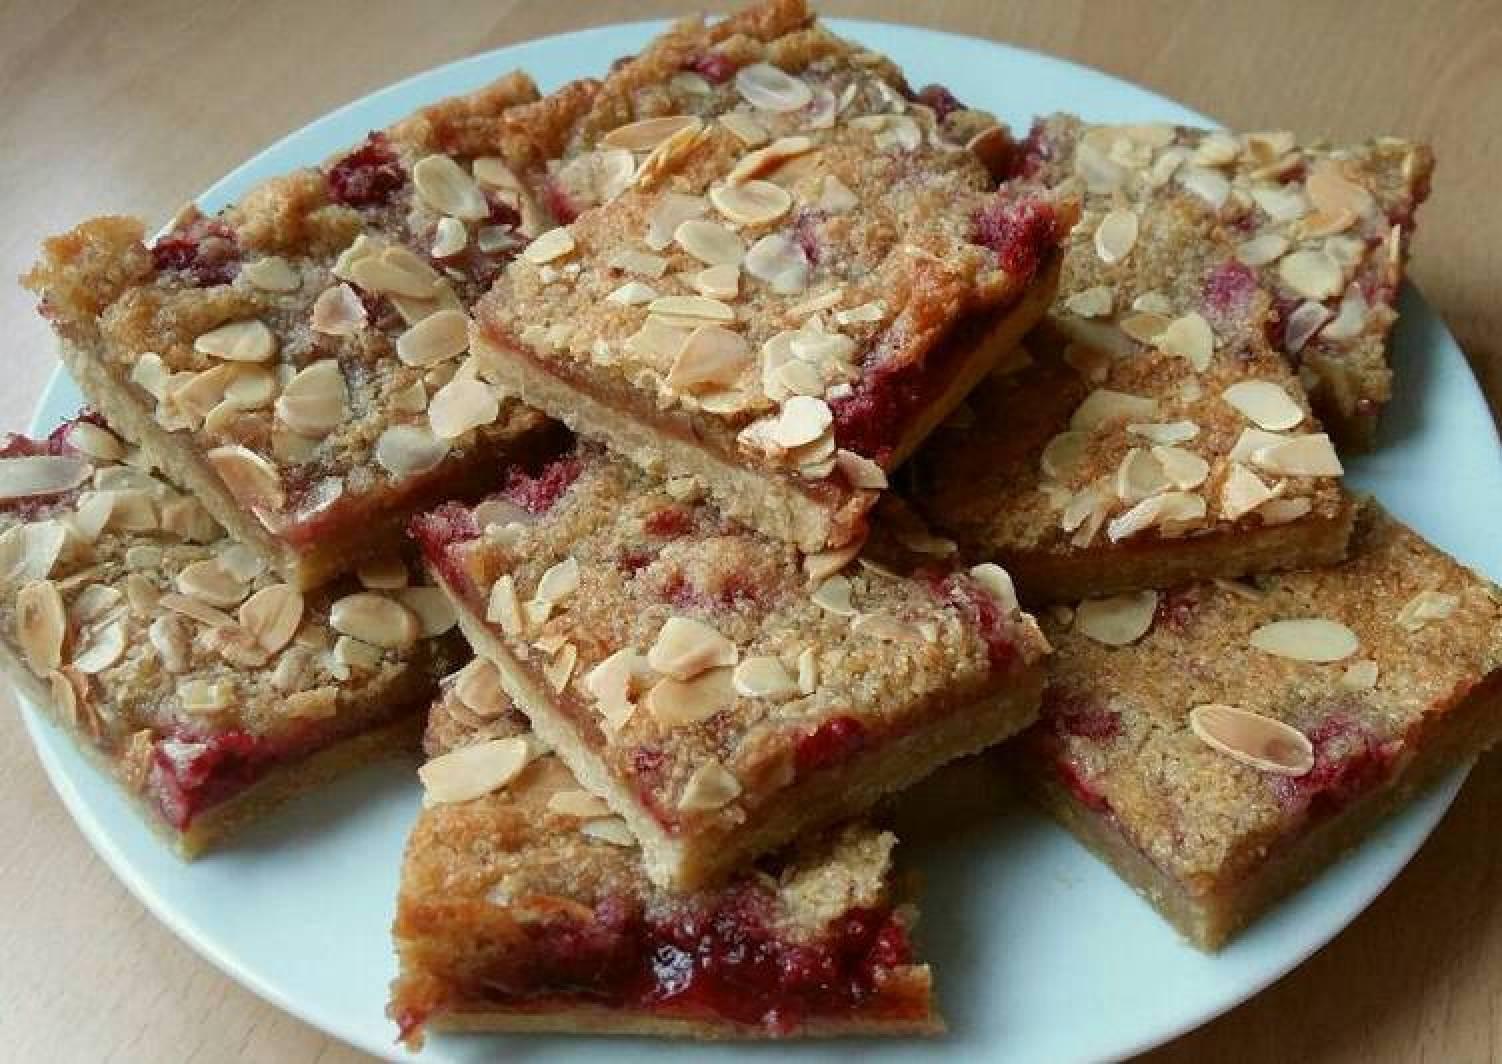 Vickys Raspberry Bakewell Tart Traybake, GF DF EF SF